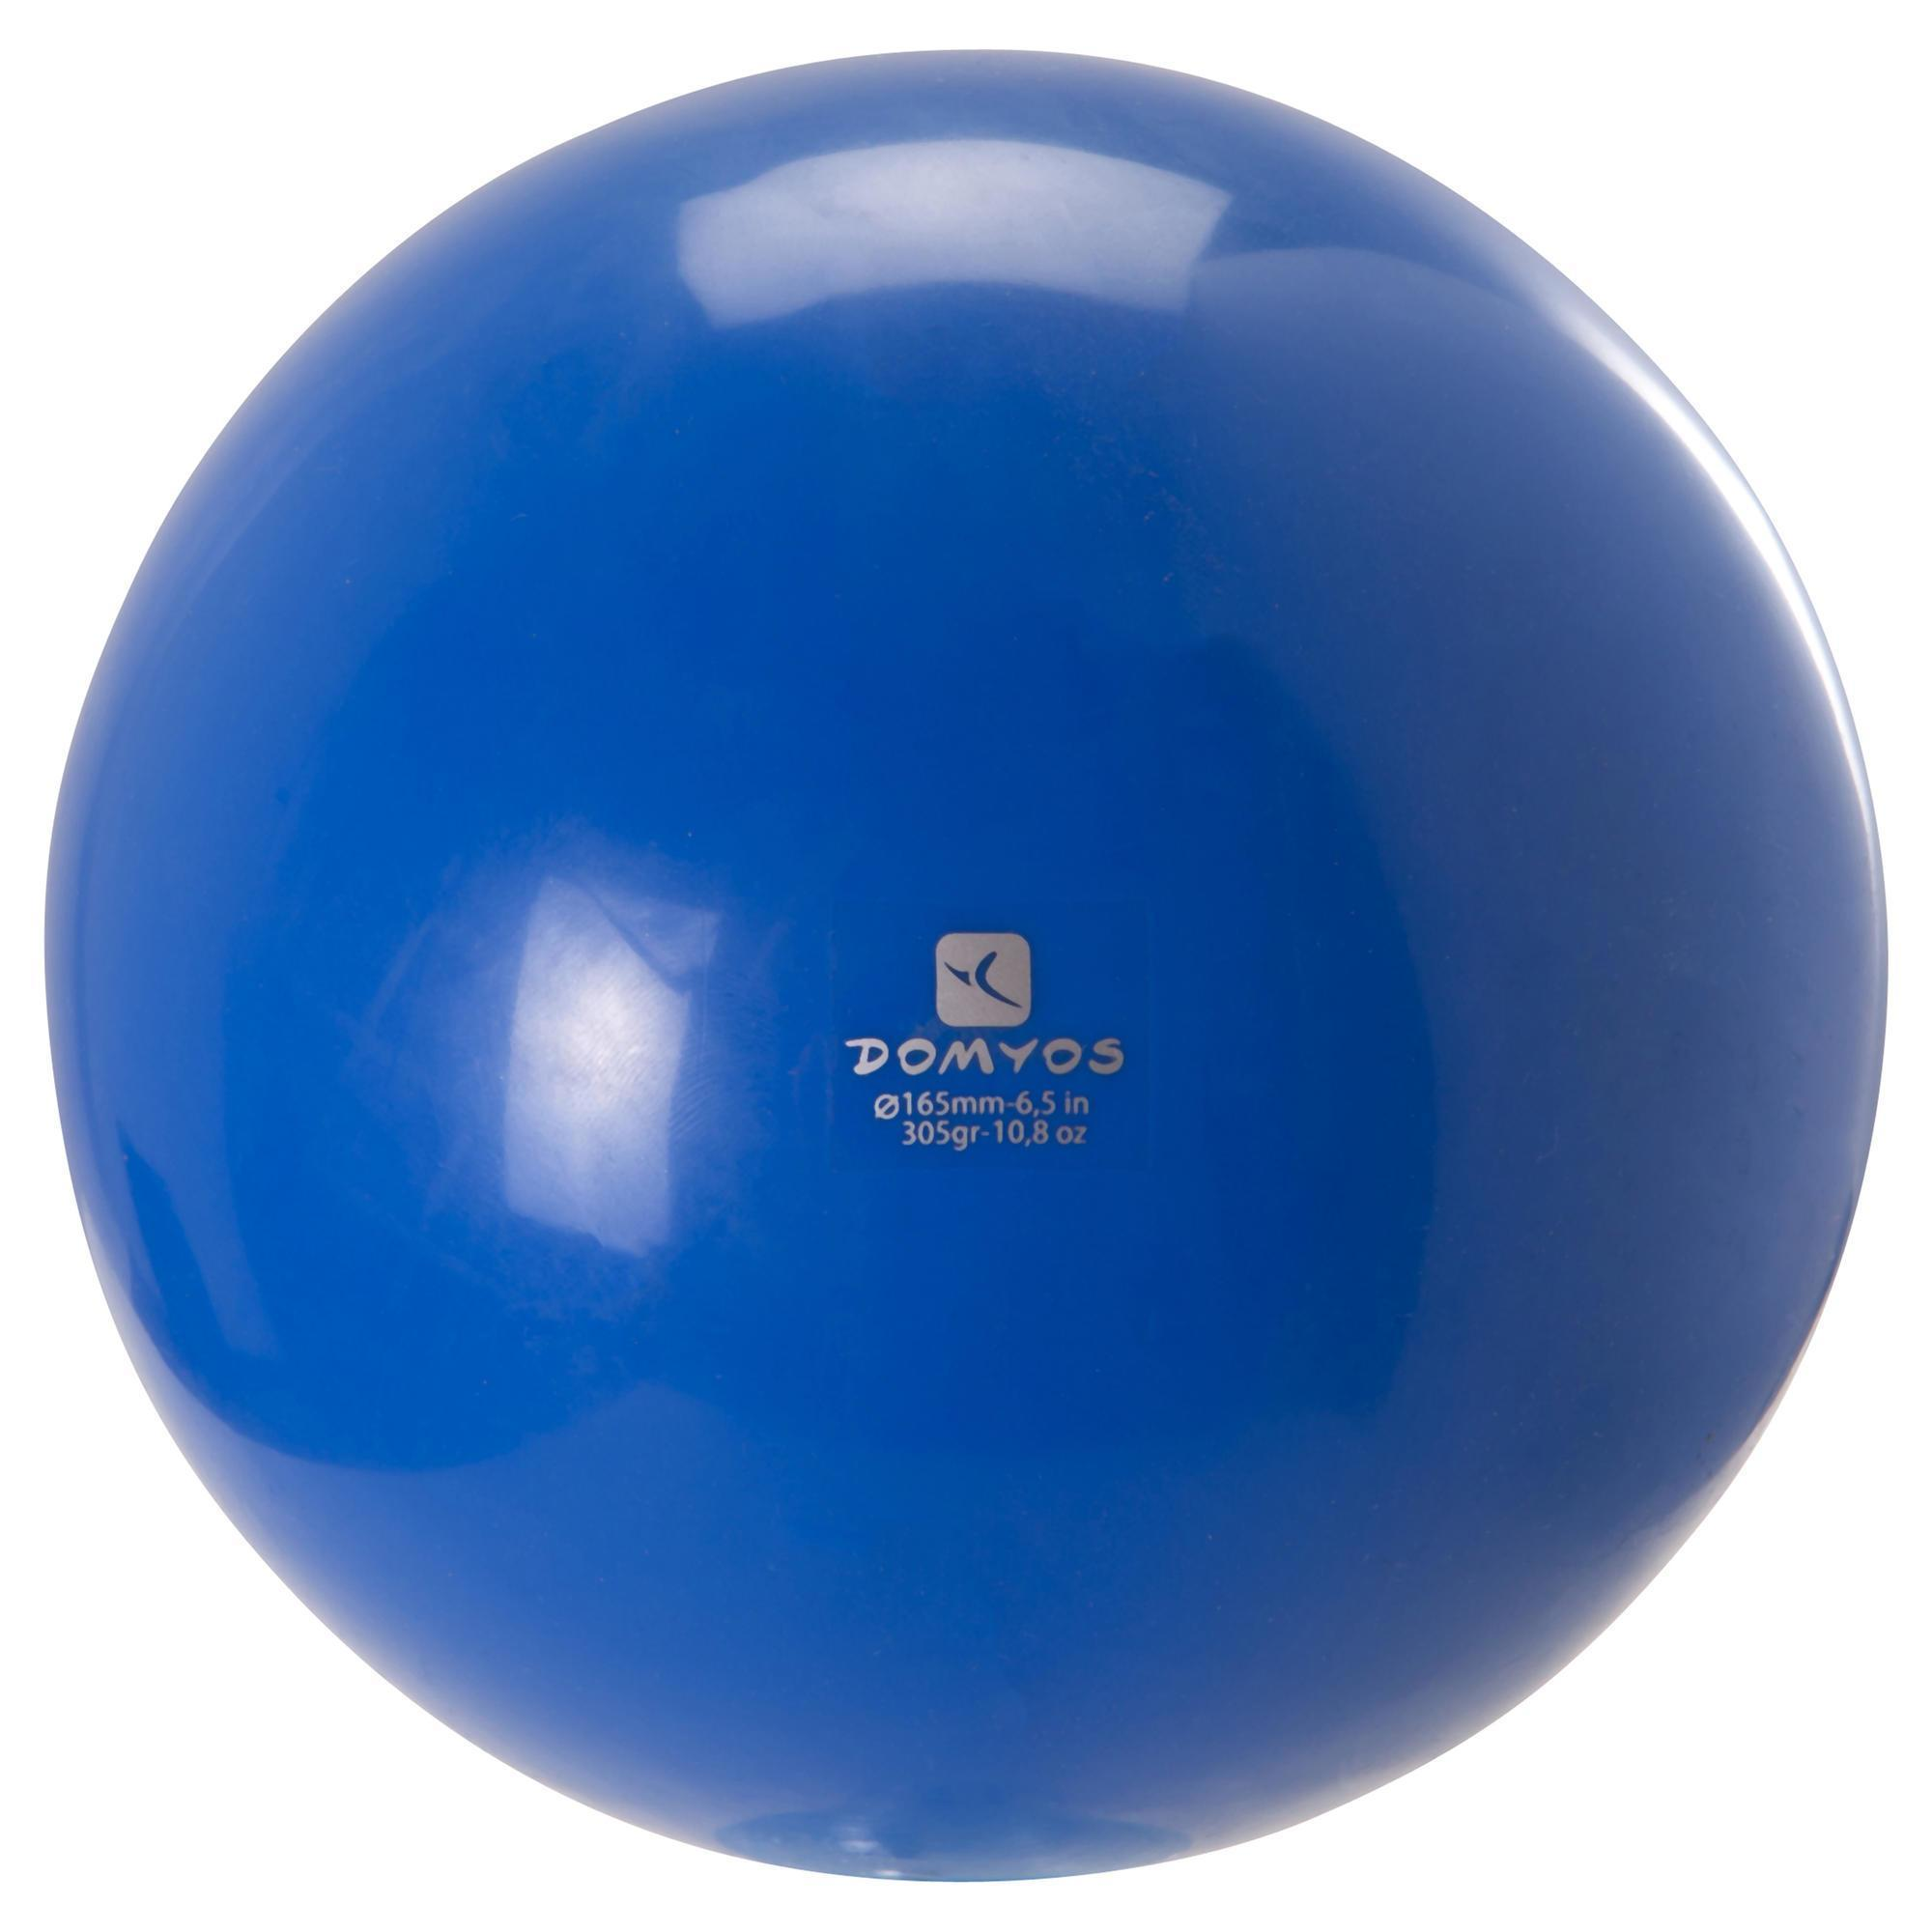 ballon de gymnastique rythmique 165 mm bleu domyos by decathlon. Black Bedroom Furniture Sets. Home Design Ideas